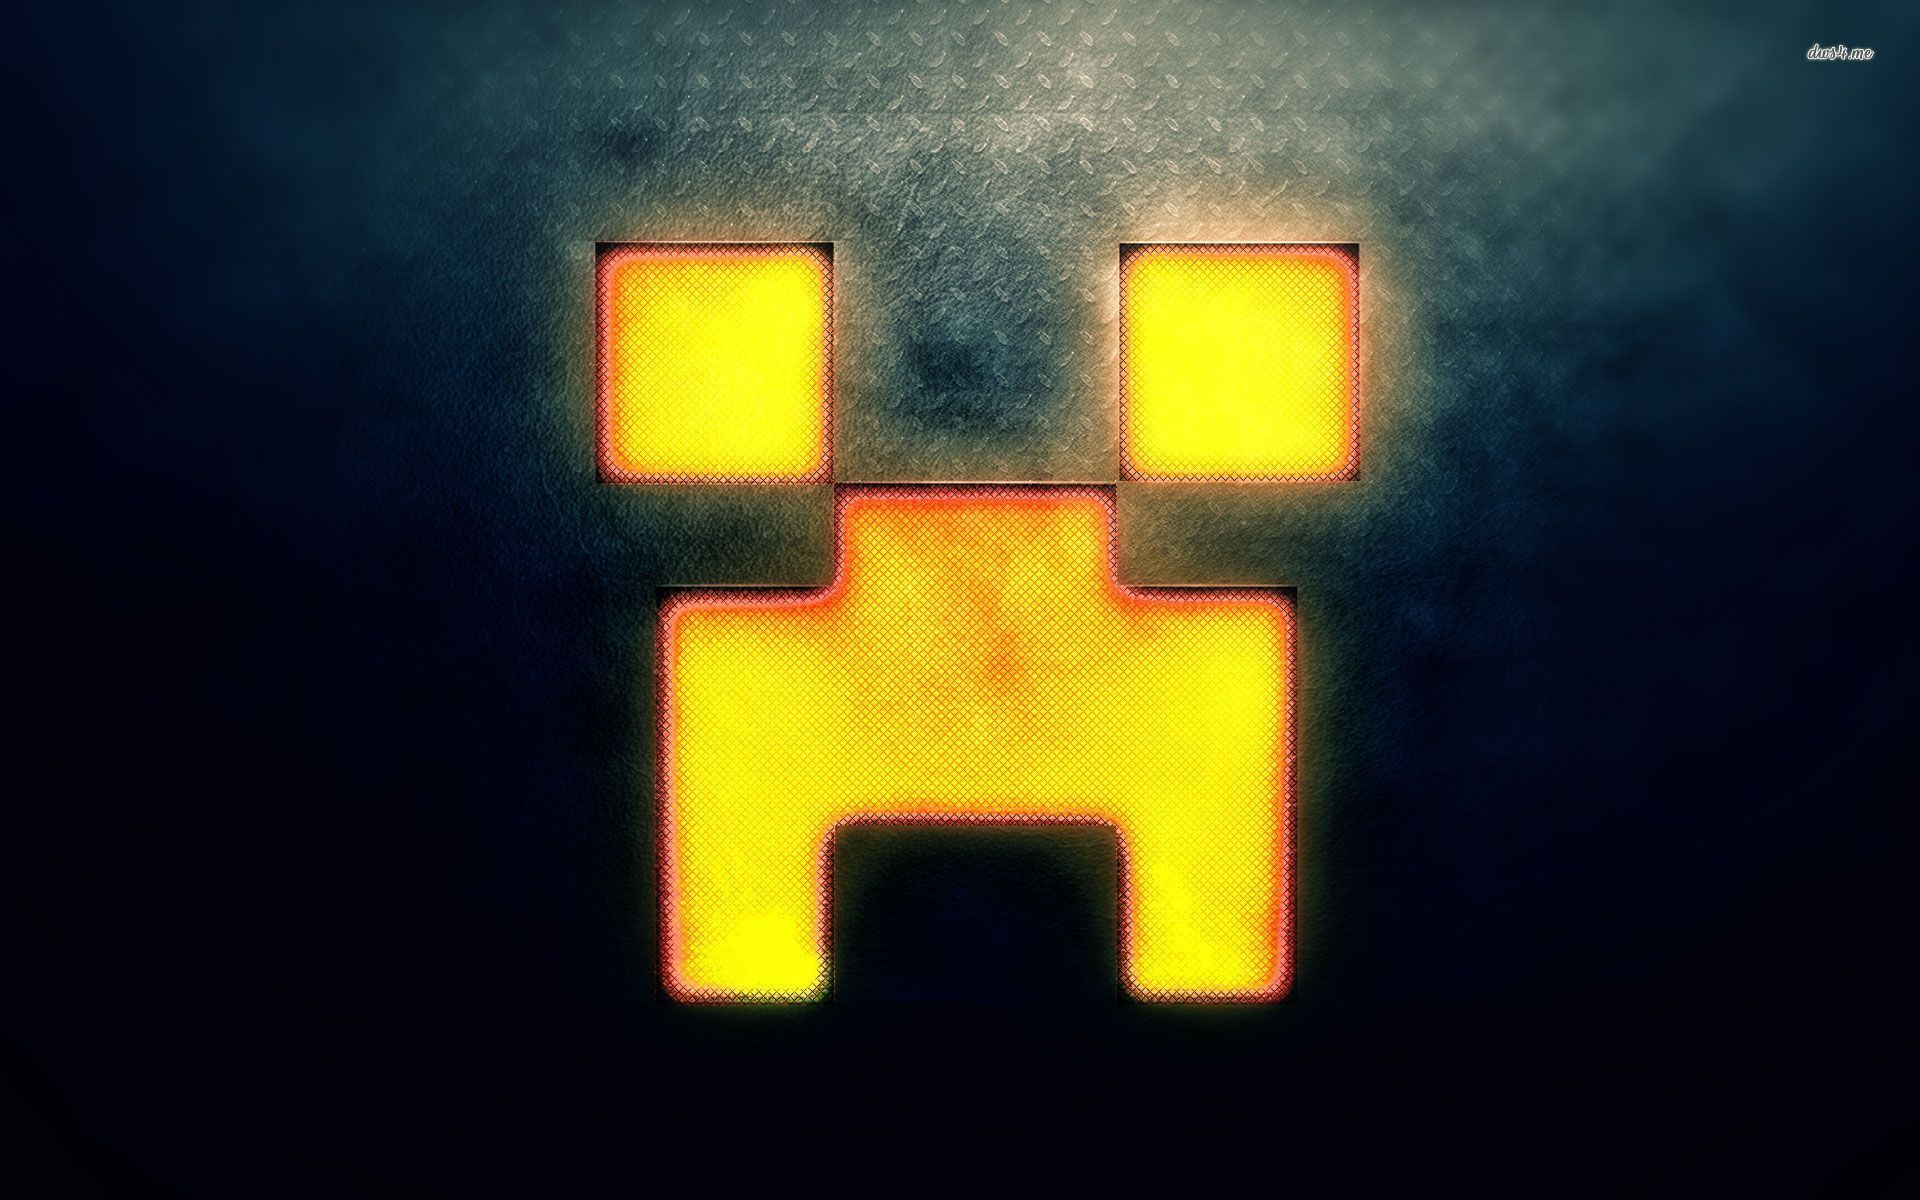 Fantastic Wallpaper Minecraft Google - bb4eef7cc2a6332dc5d5750c84e0132d  Photograph_573977.jpg